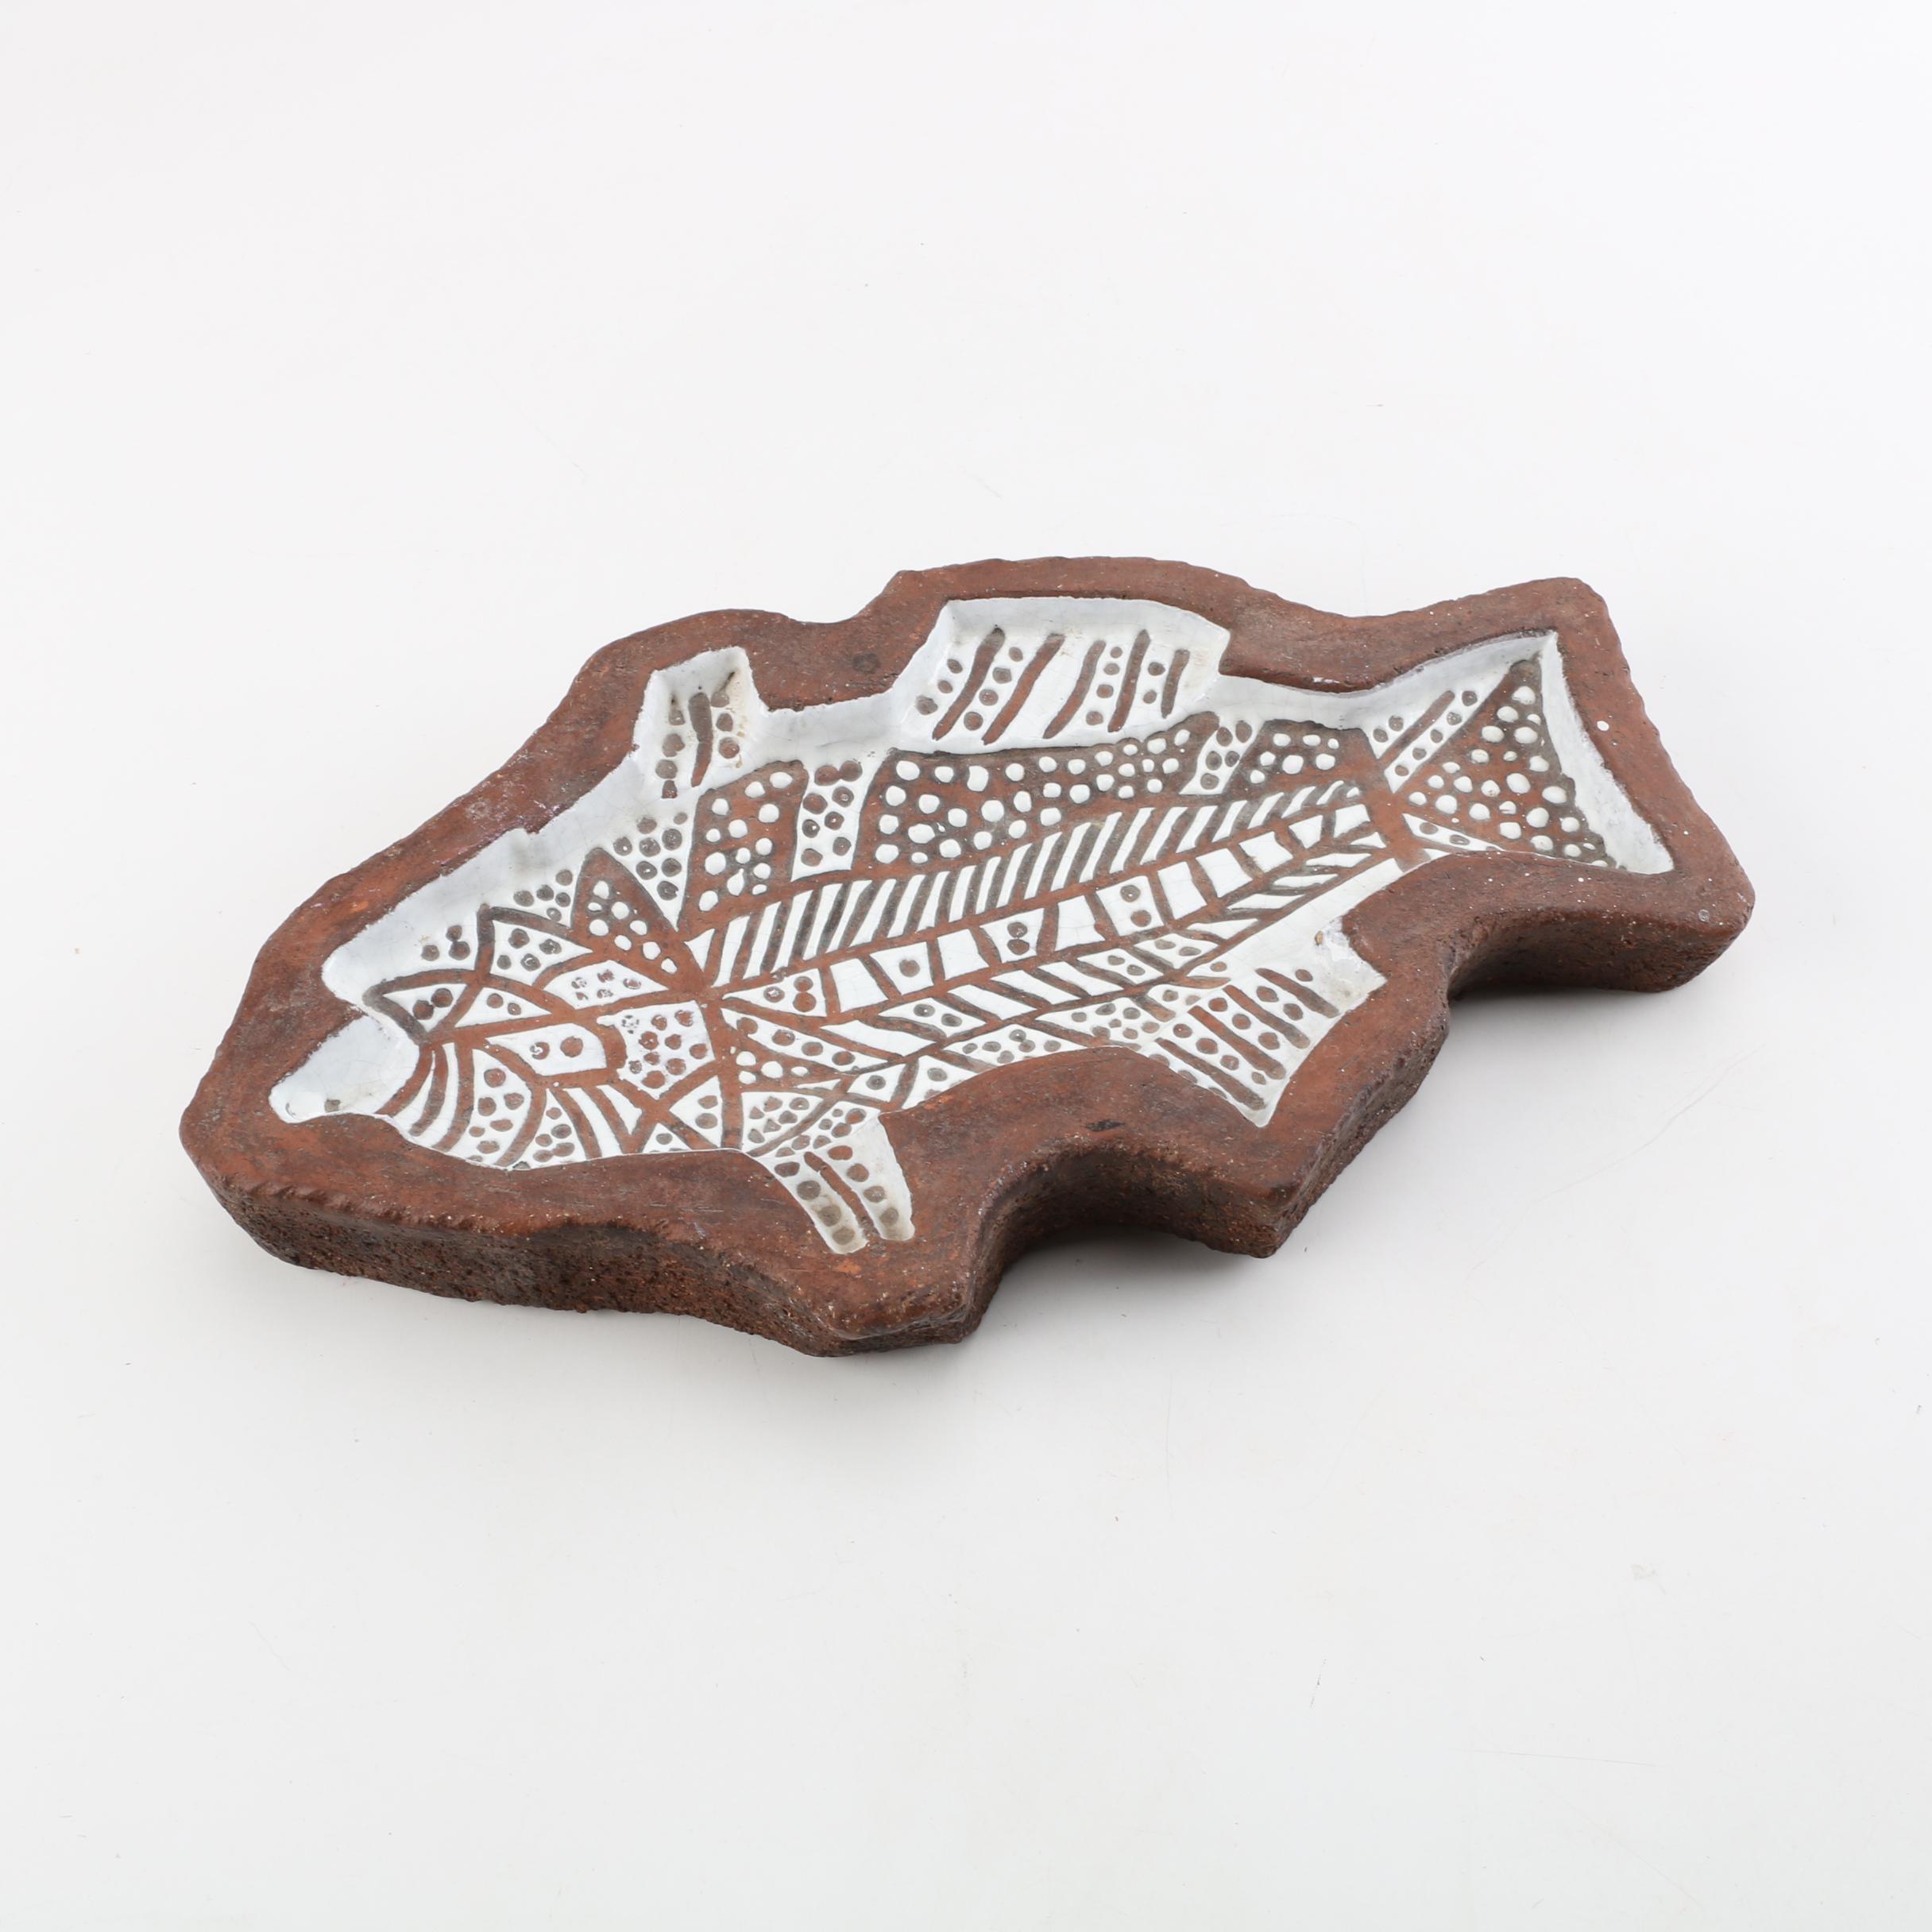 Italian Terracotta Sgraffito Fish Shaped Platter